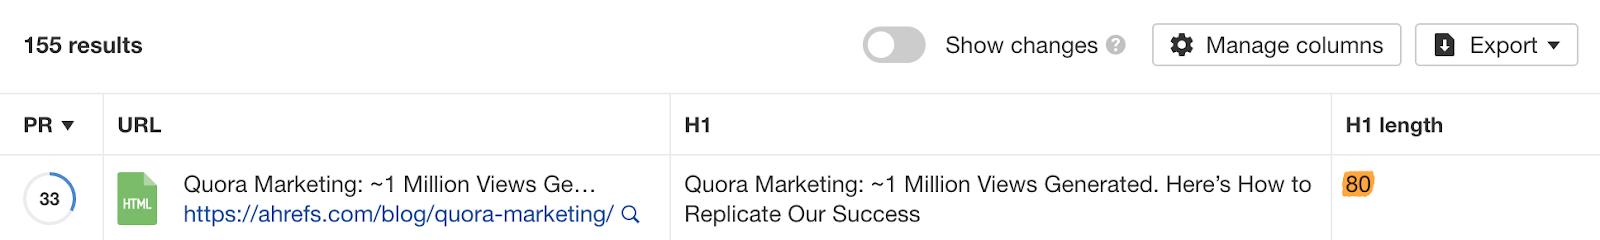 11 quora marketing